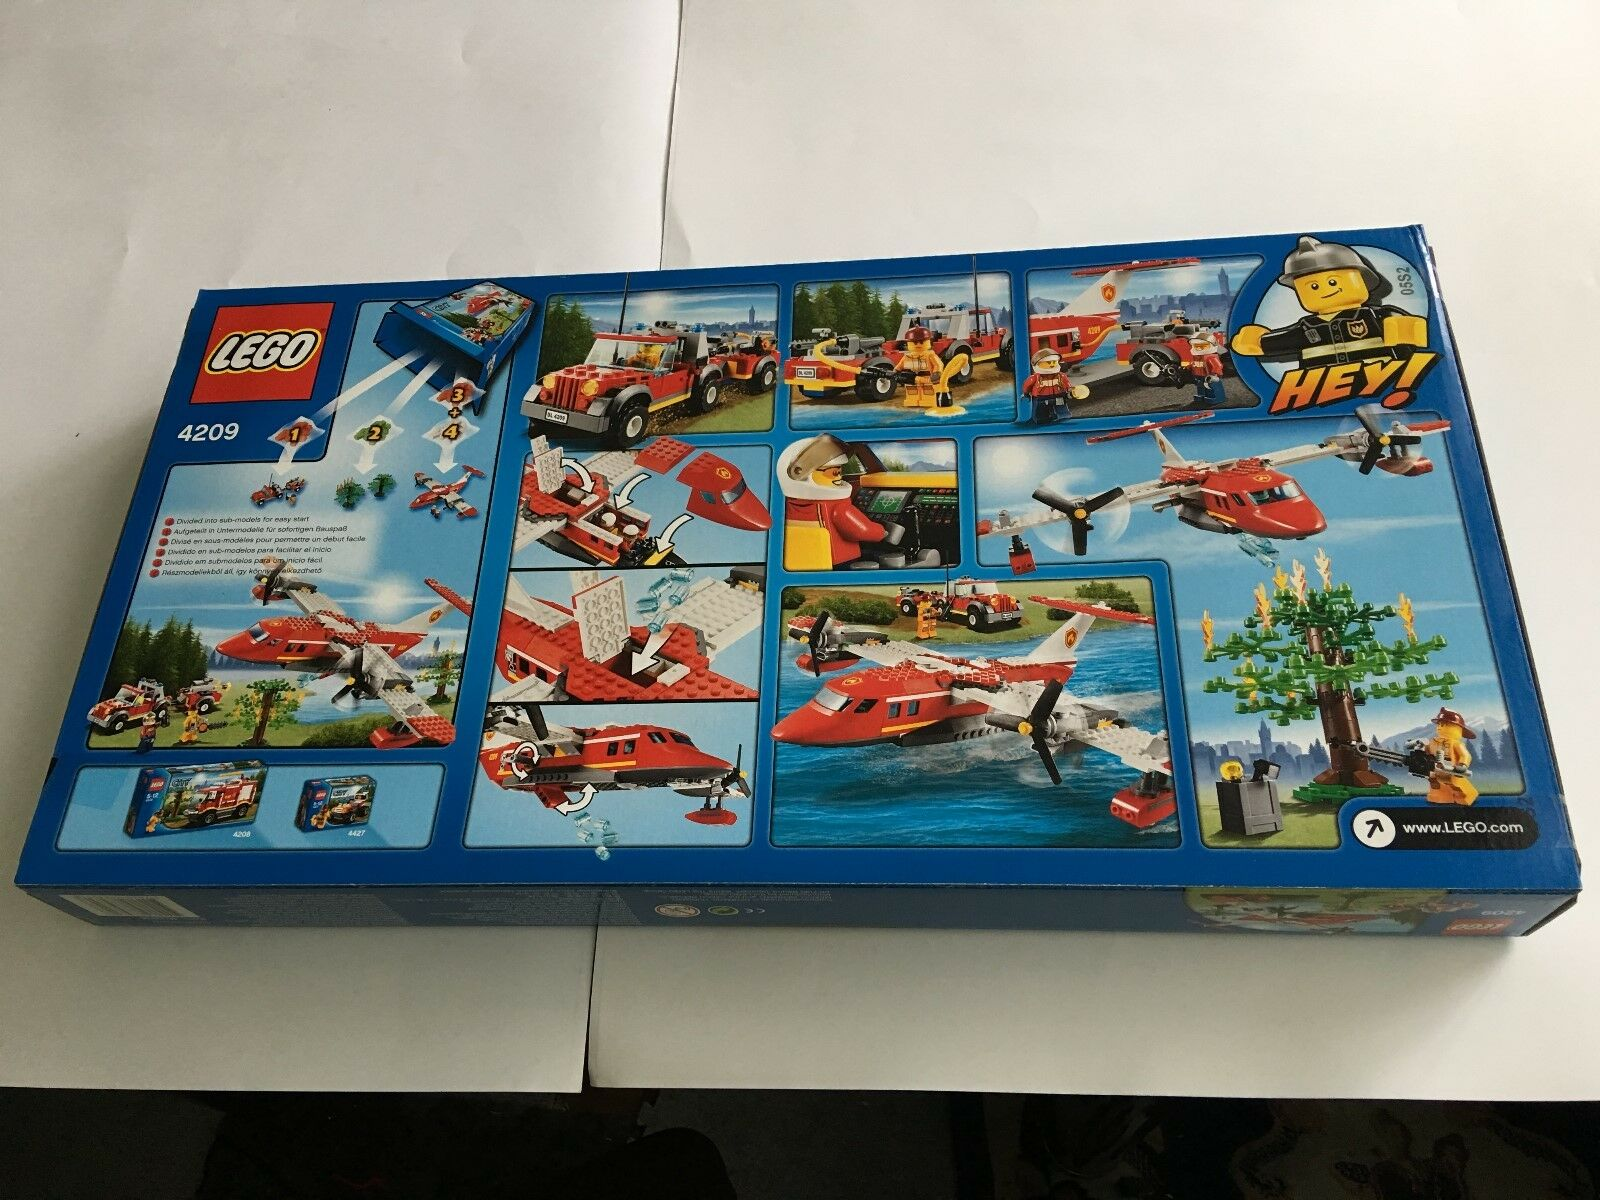 LEGO City Fire Plane - Set 4209 - Brand New & Sealed